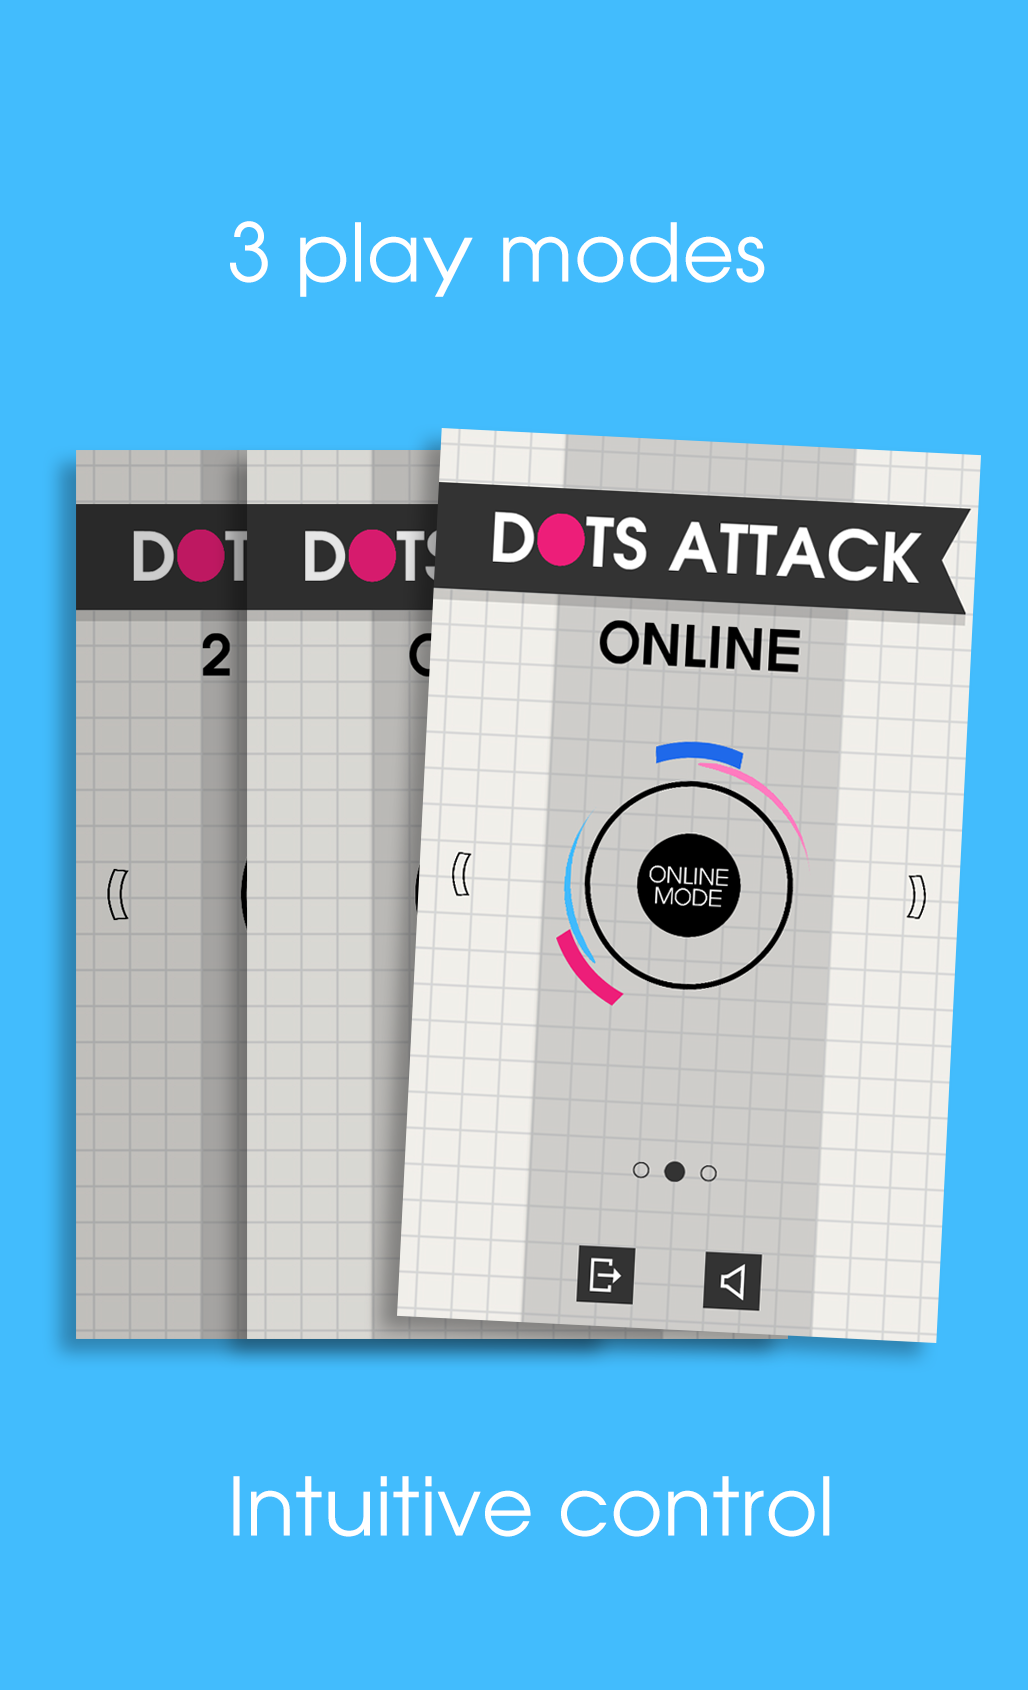 Dots Attack